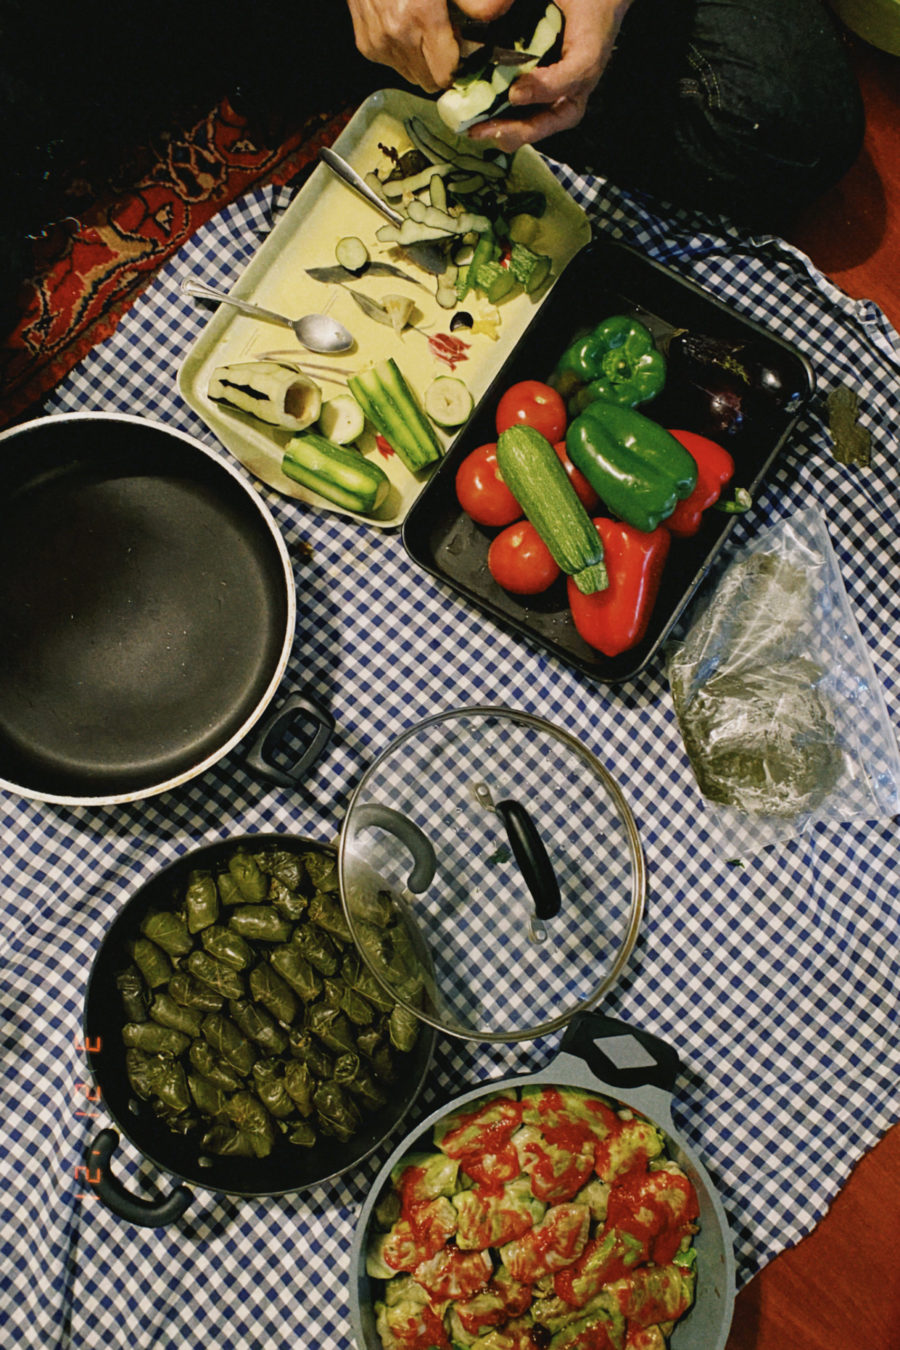 domla ingredients in bowls